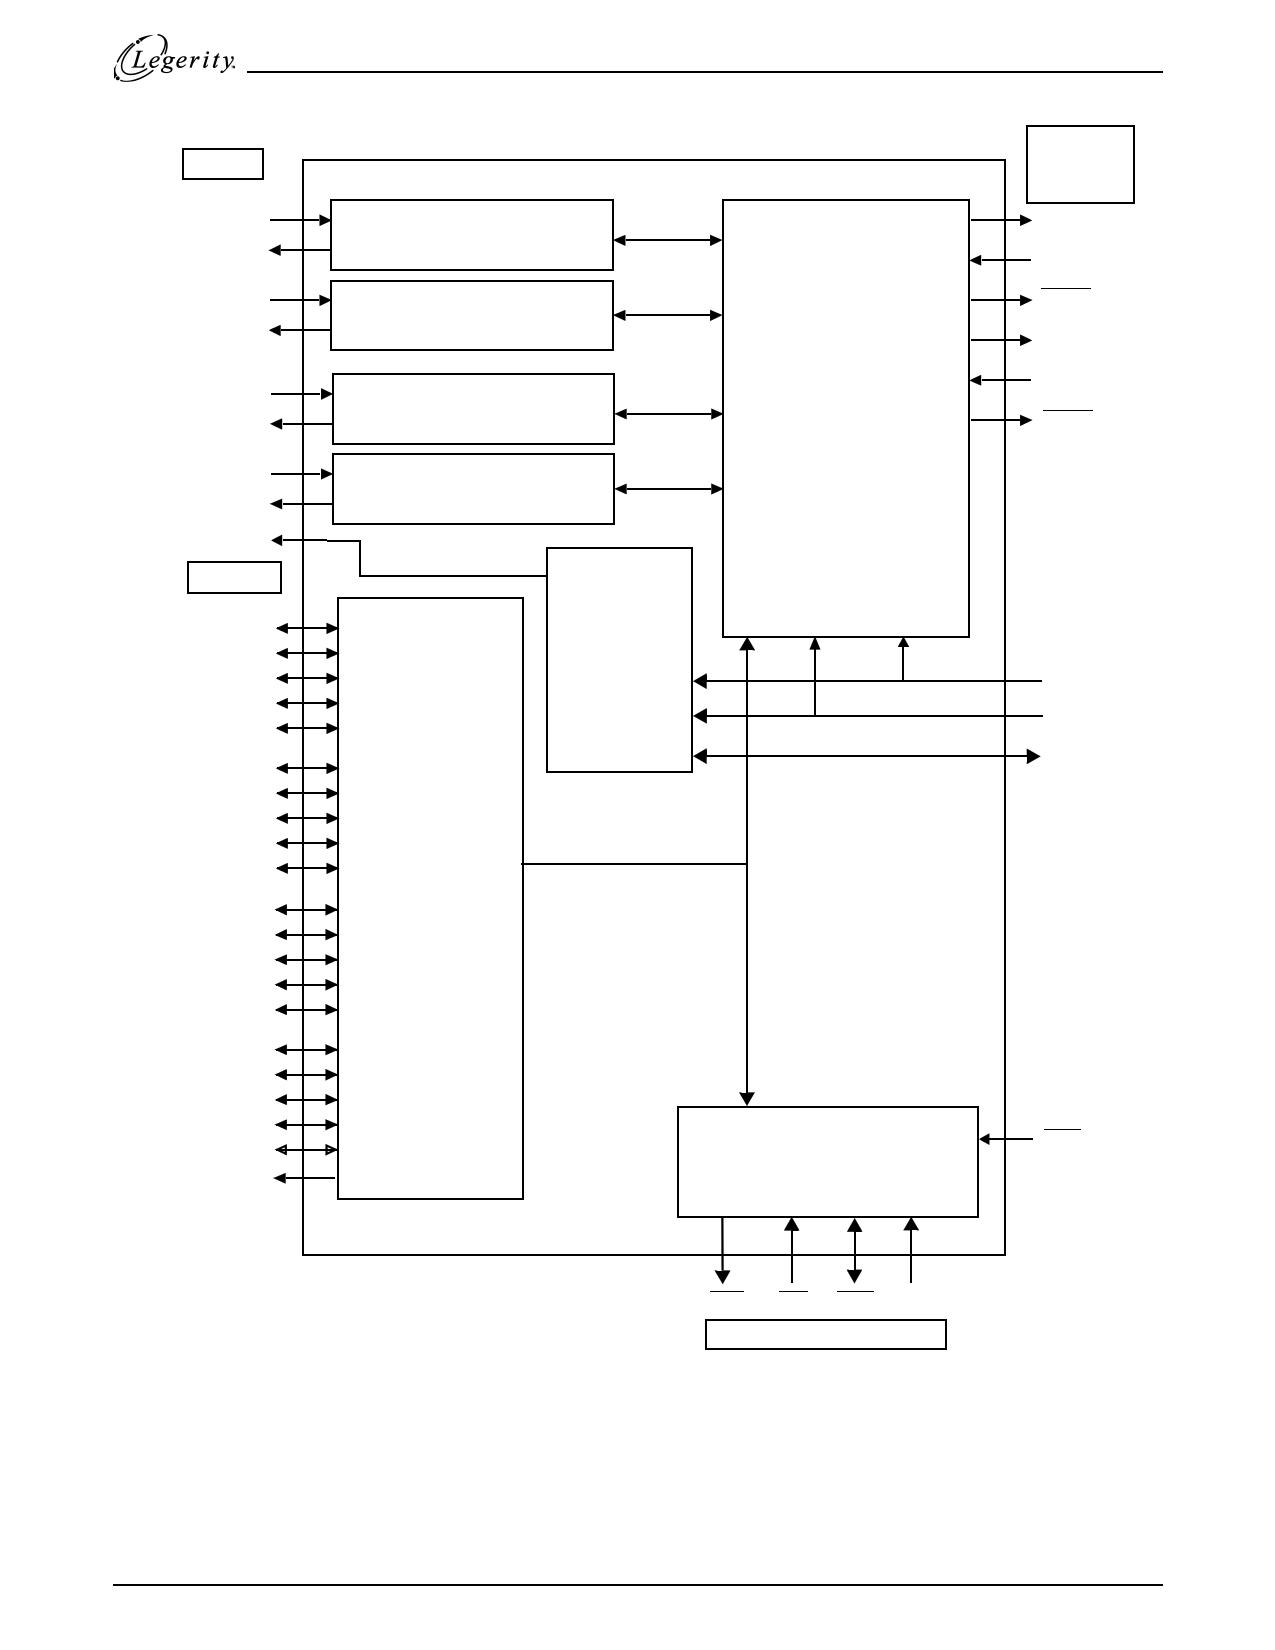 Am79Q021 pdf, 반도체, 판매, 대치품